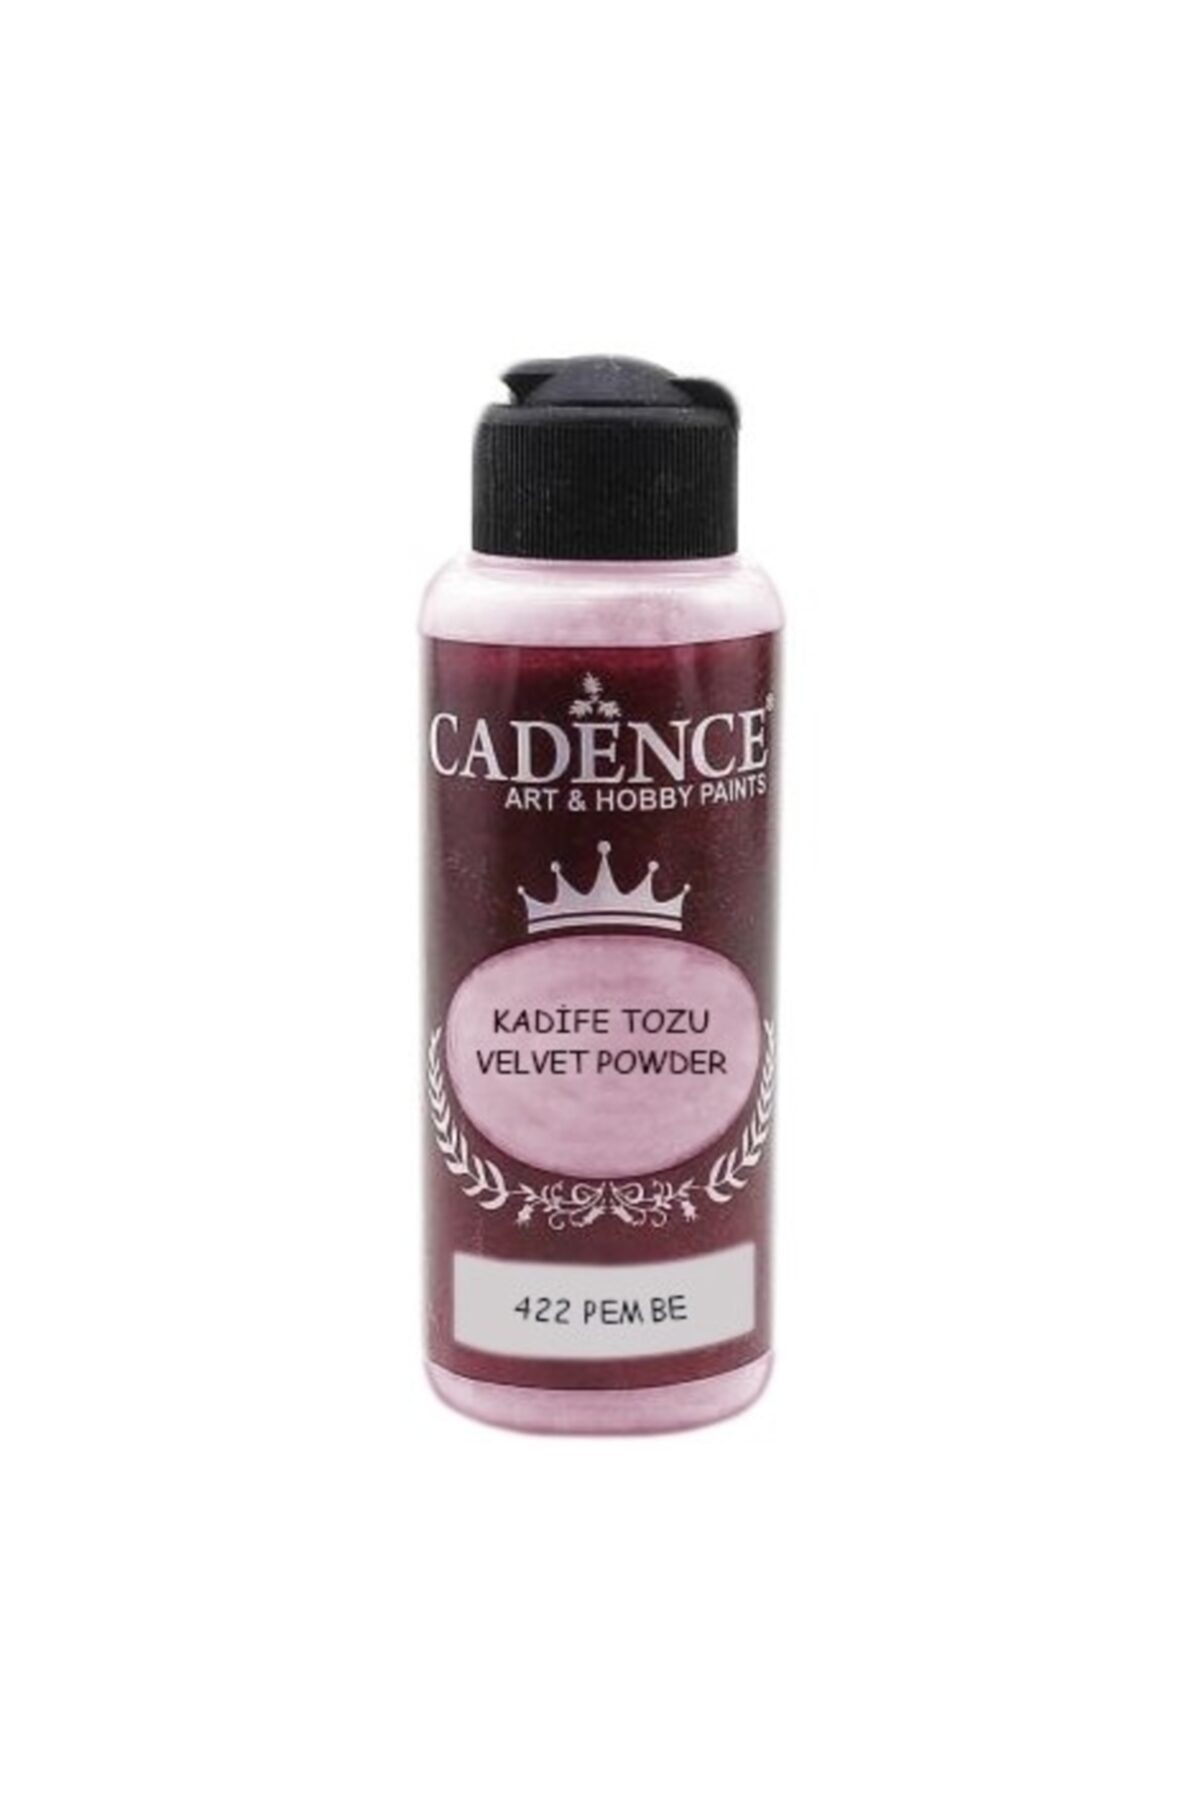 Cadence Kadife Tozu Pembe 422